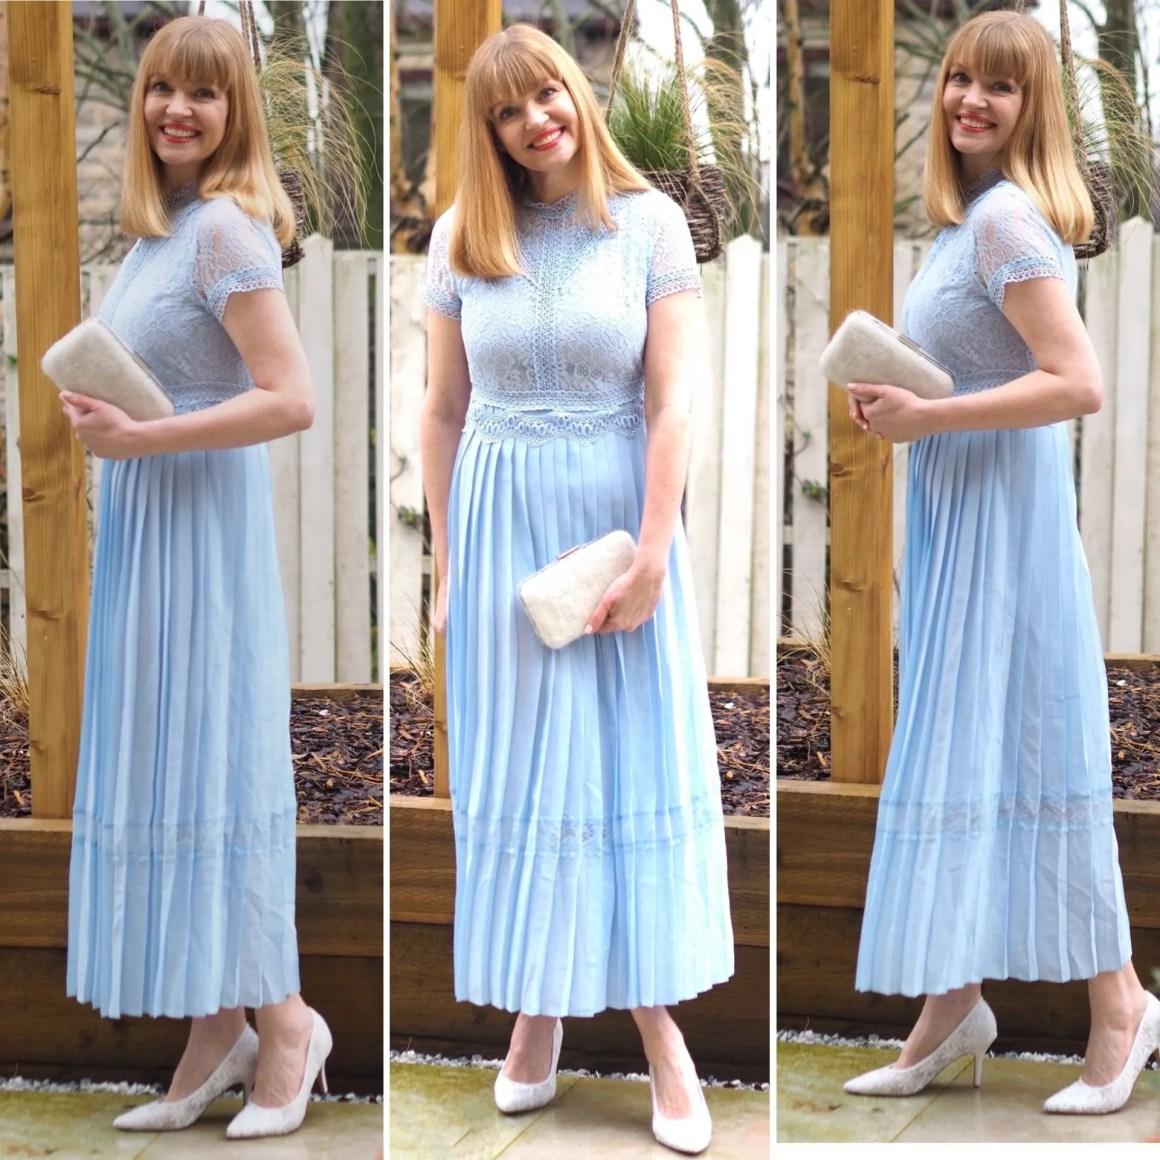 Ice blue lace bodice dress